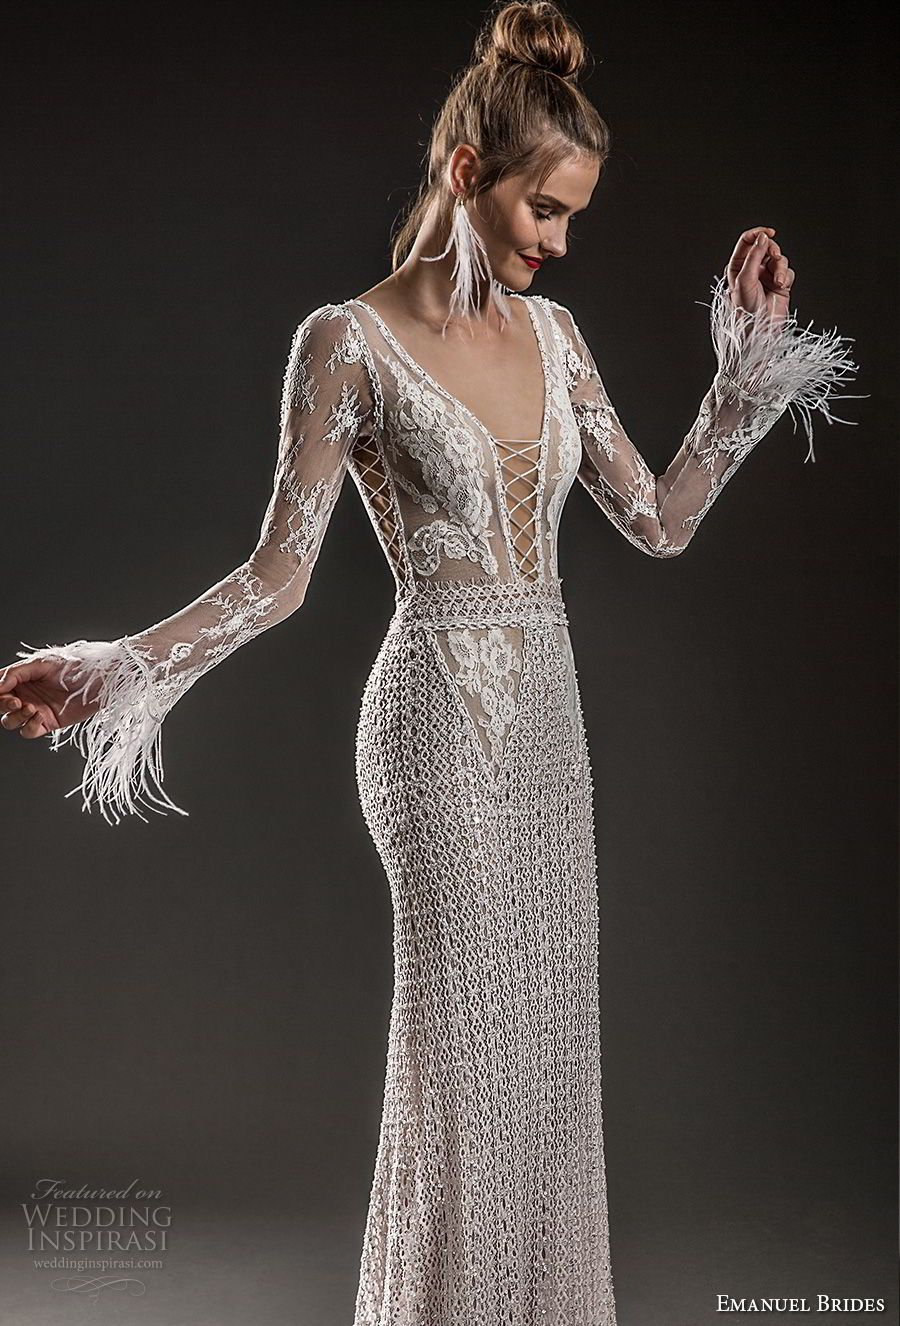 Emanuel Brides 2018 Wedding Dresses   Pinterest   Wedding dress ...